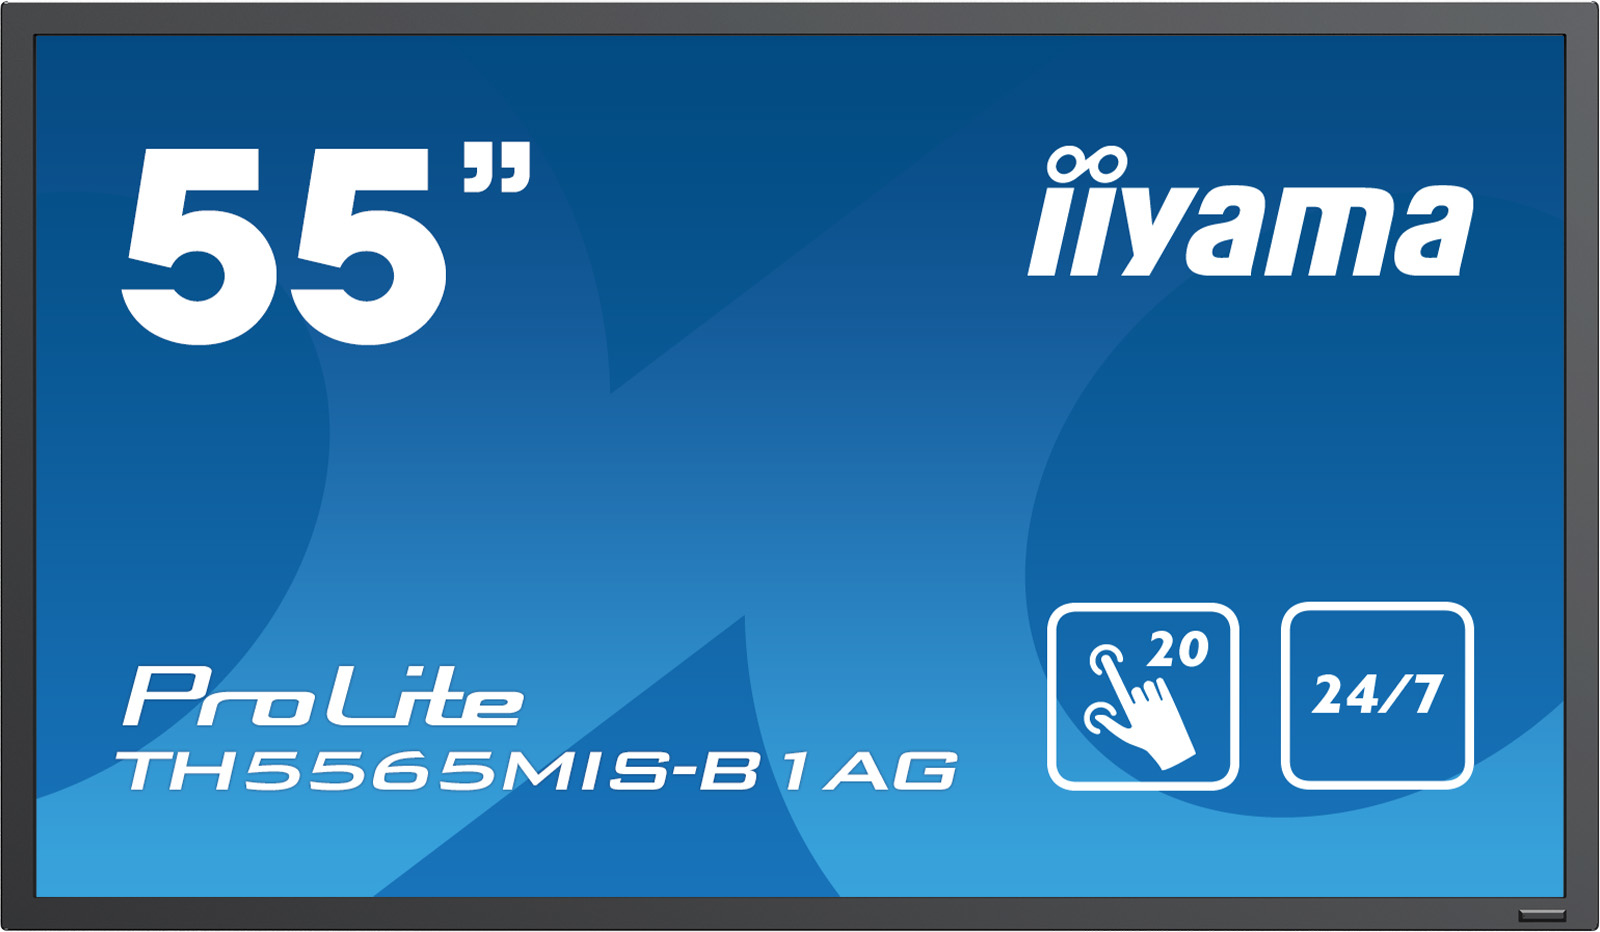 Iiyama ProLite TH5565MIS-B1AG - 140 cm (55) Klasse (138.8 cm (54.6) sichtbar) LED-Display - Digital Signage